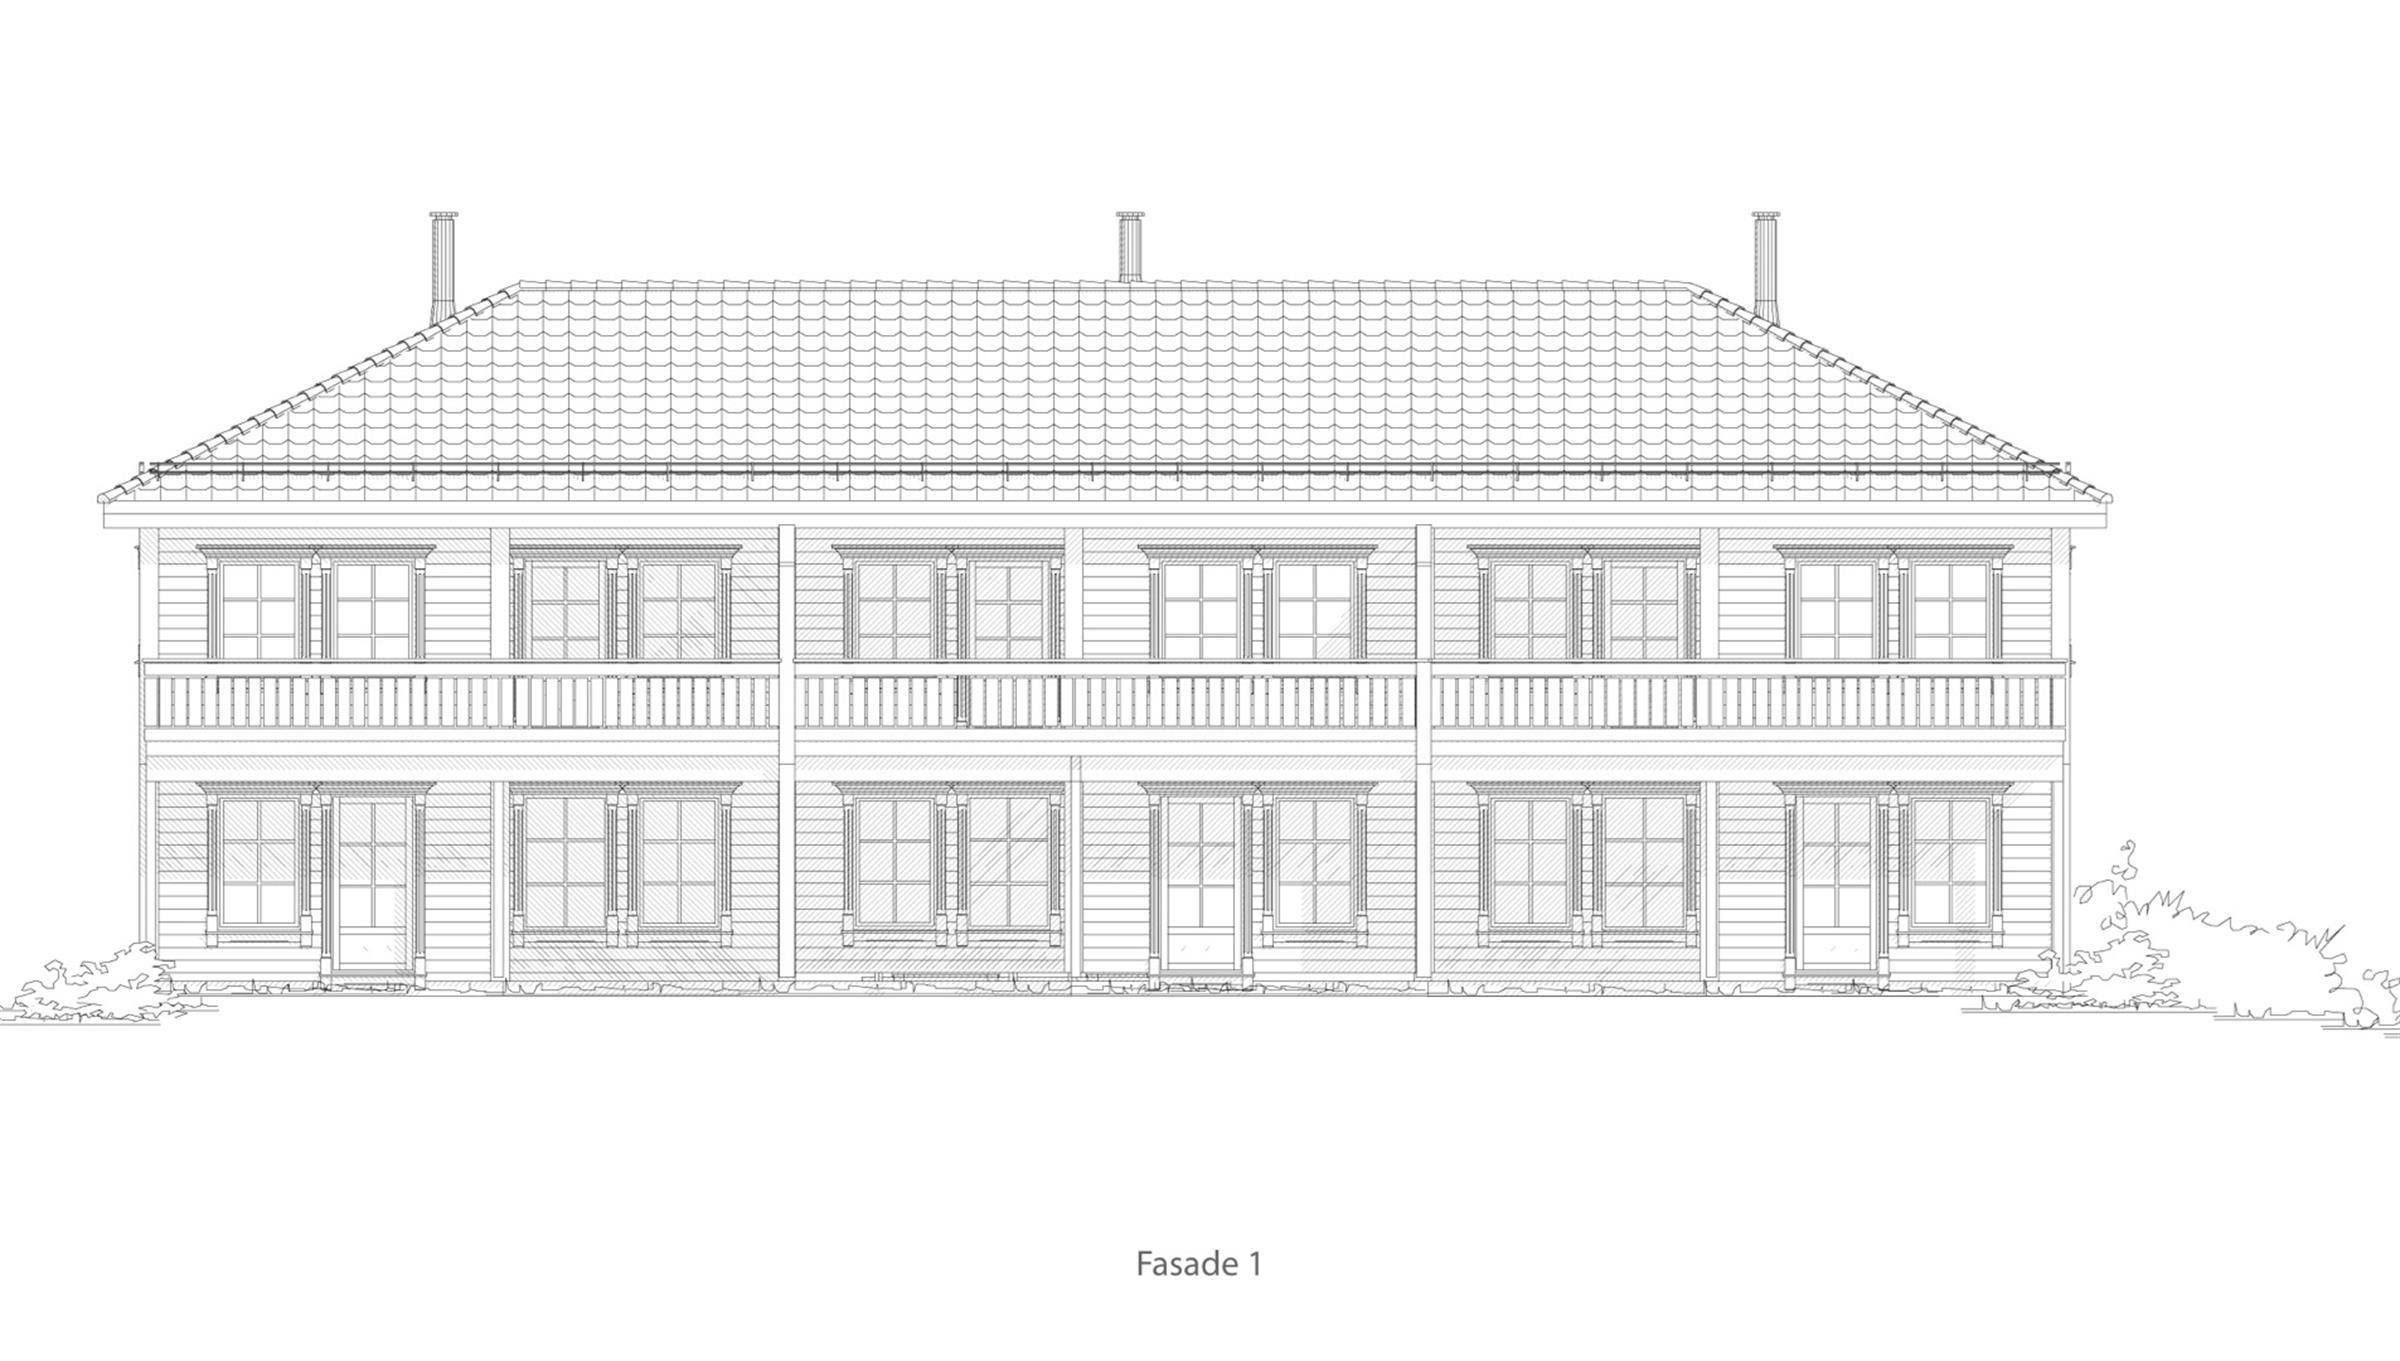 Gjøvik fasade 1